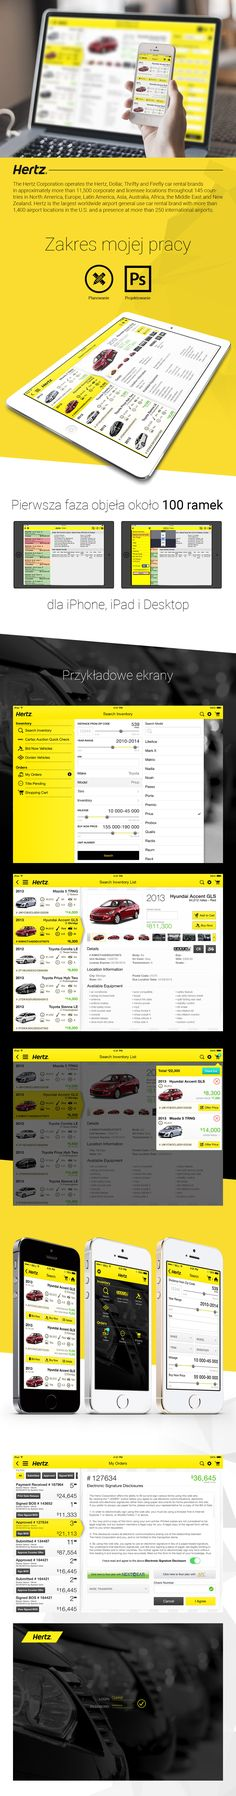 Hertz Mobile   UI/UX   User Interface   Photoshop